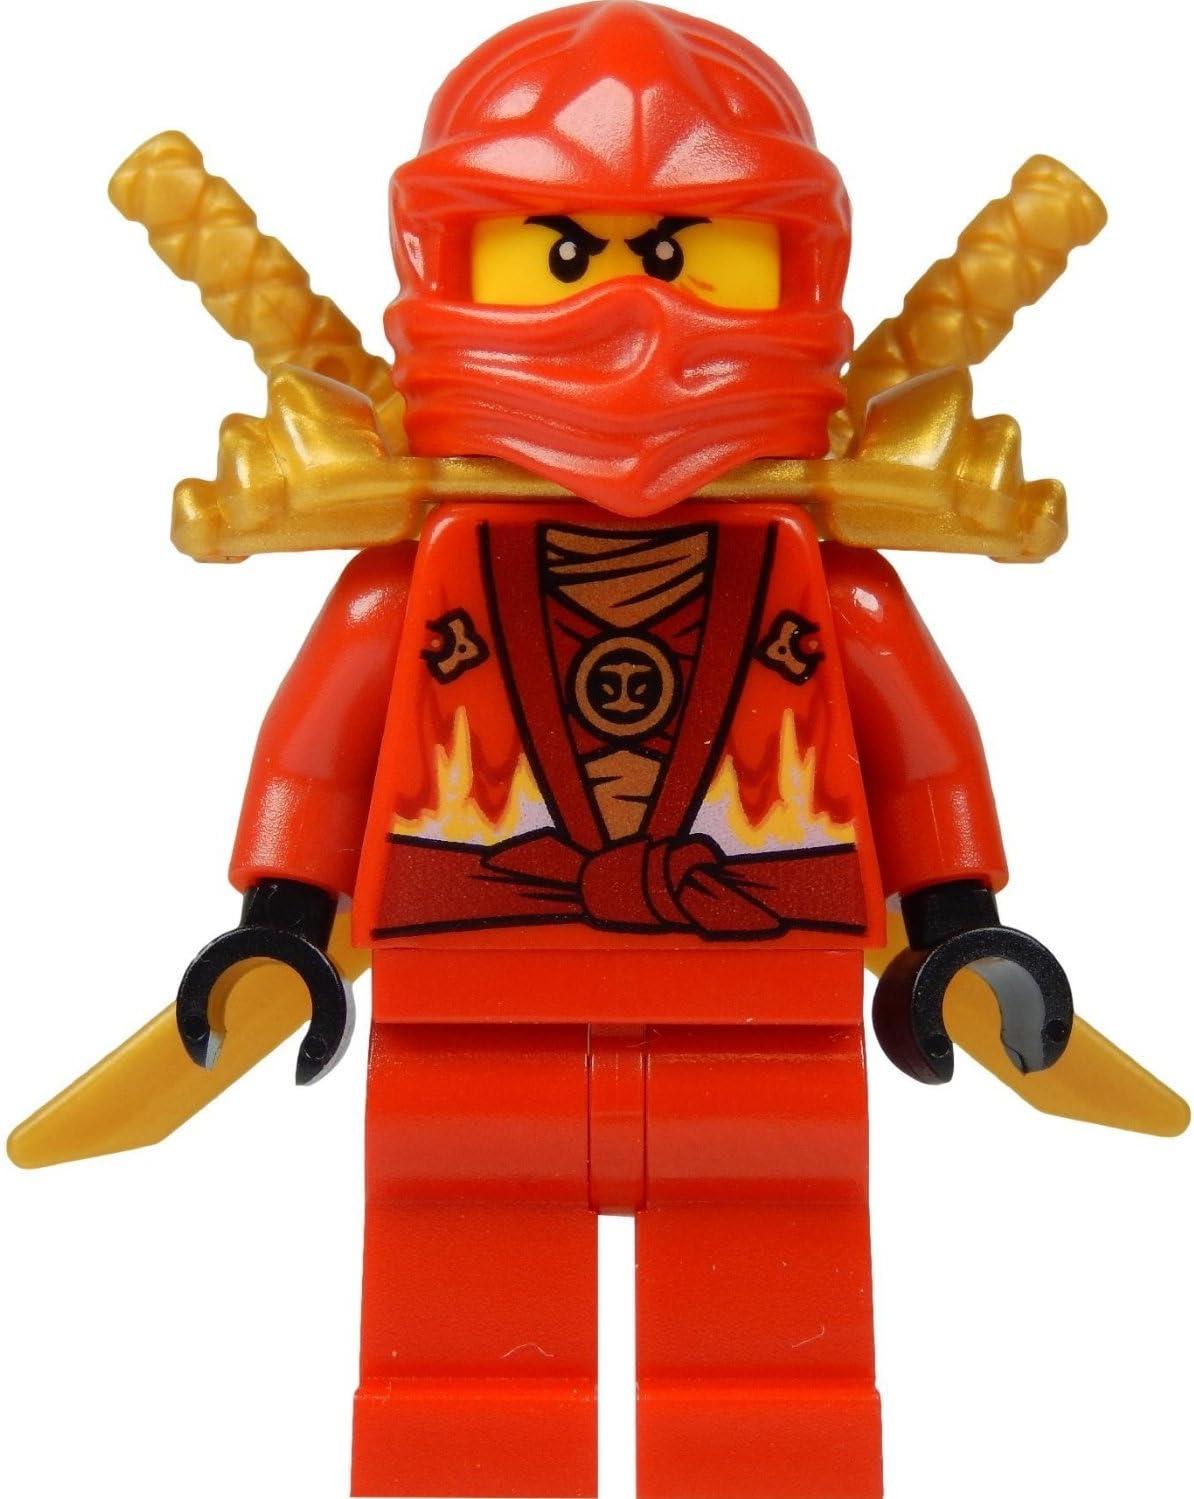 LEGO Ninjago: Kai Minifig (Red Ninja) with Two Gold Swords - Limited Edition 2015